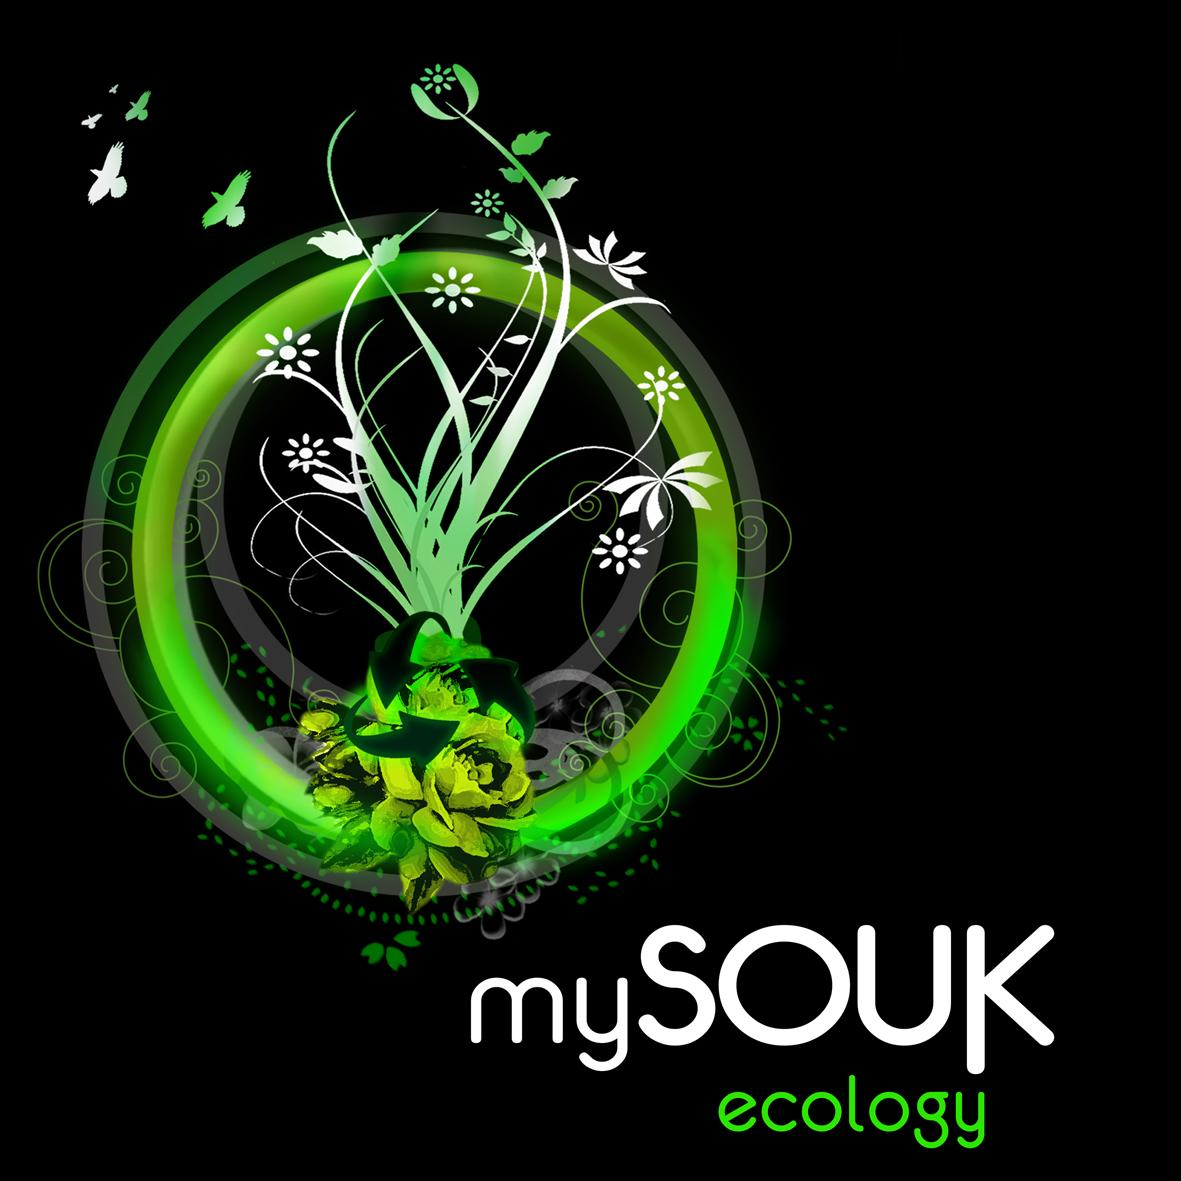 Logo mySOUK Ecology, by MCBS Multimedia